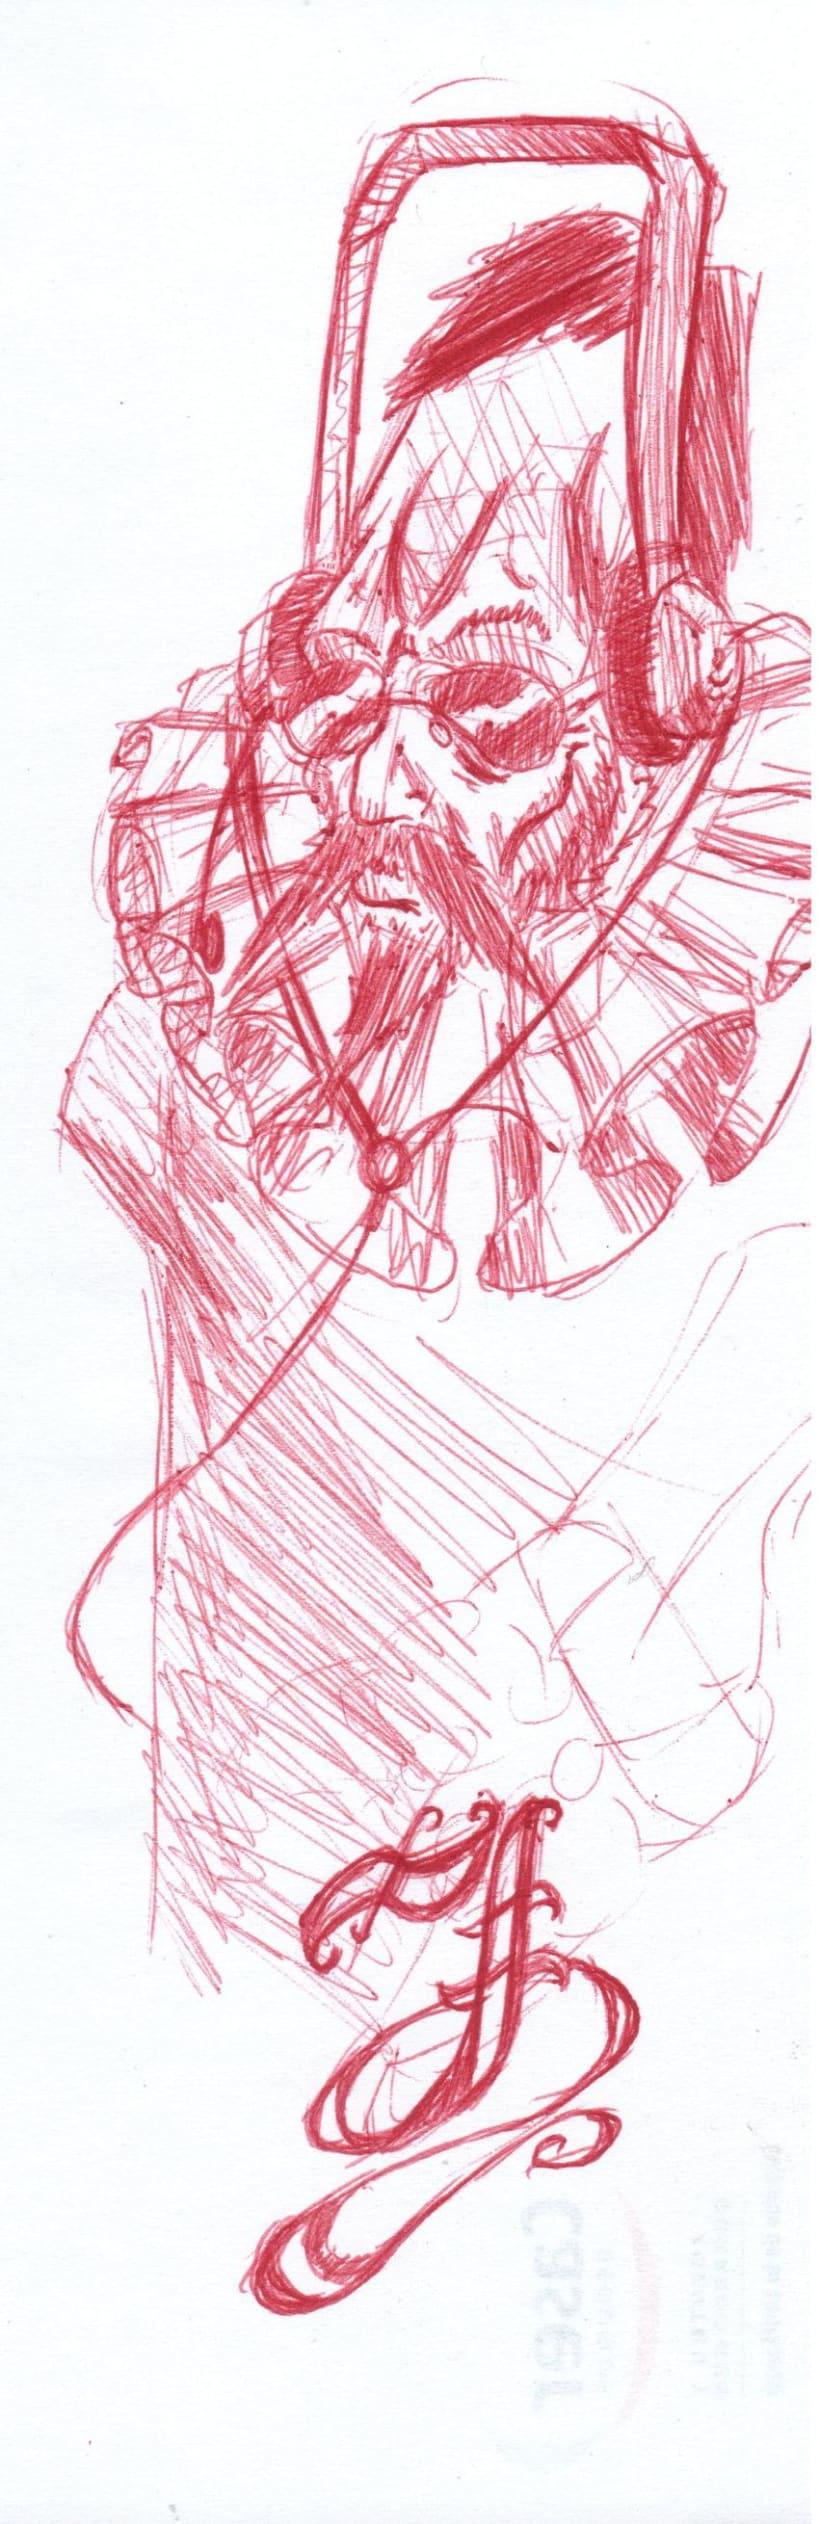 varios dibujos a boli 2